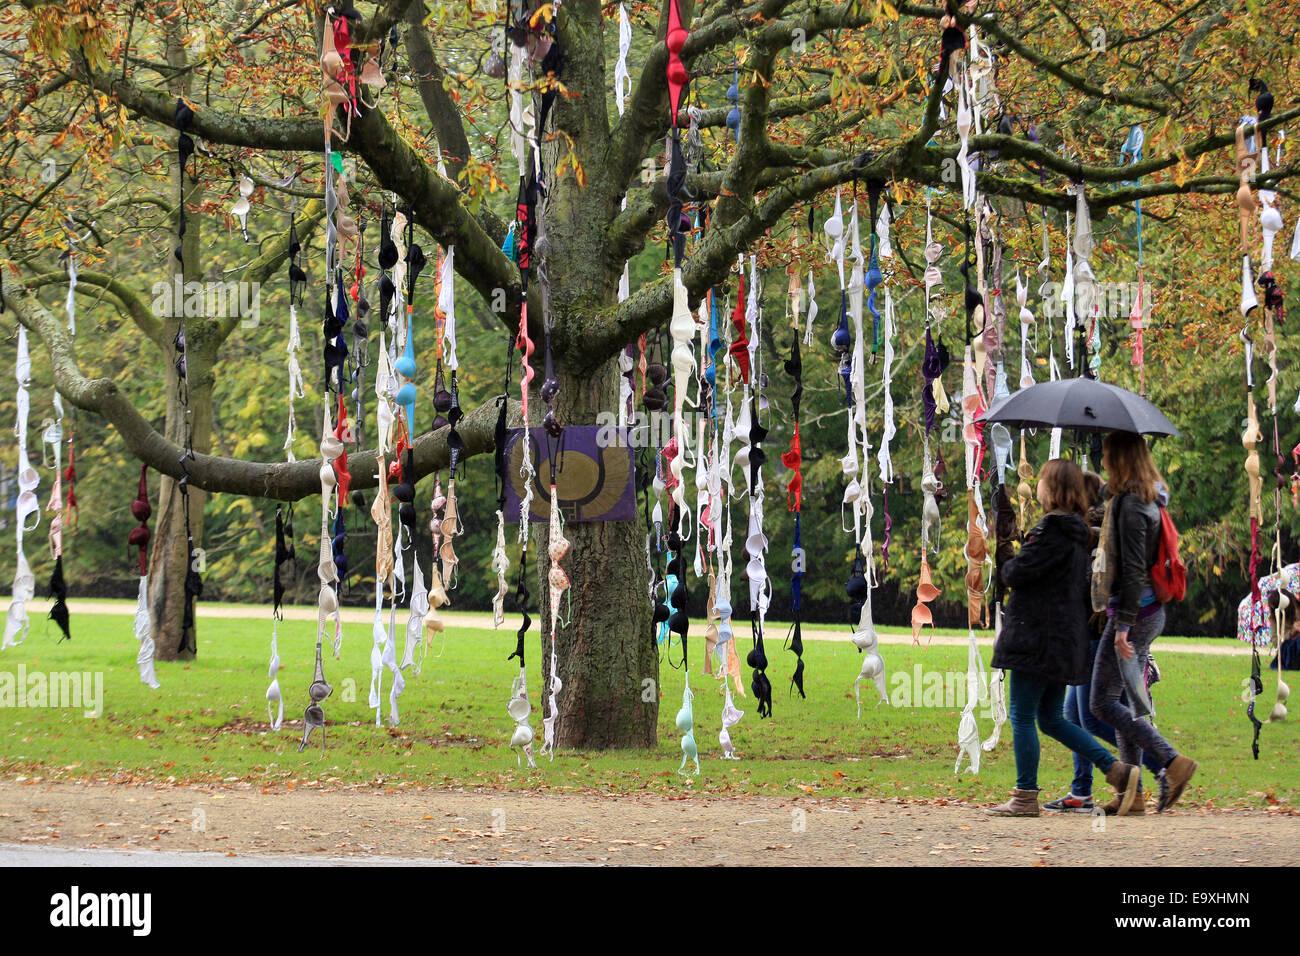 Bras are hunging on tree at Vondelpak during  International Day of the Girl Childin  manifestation on 11 Octuber, - Stock Image